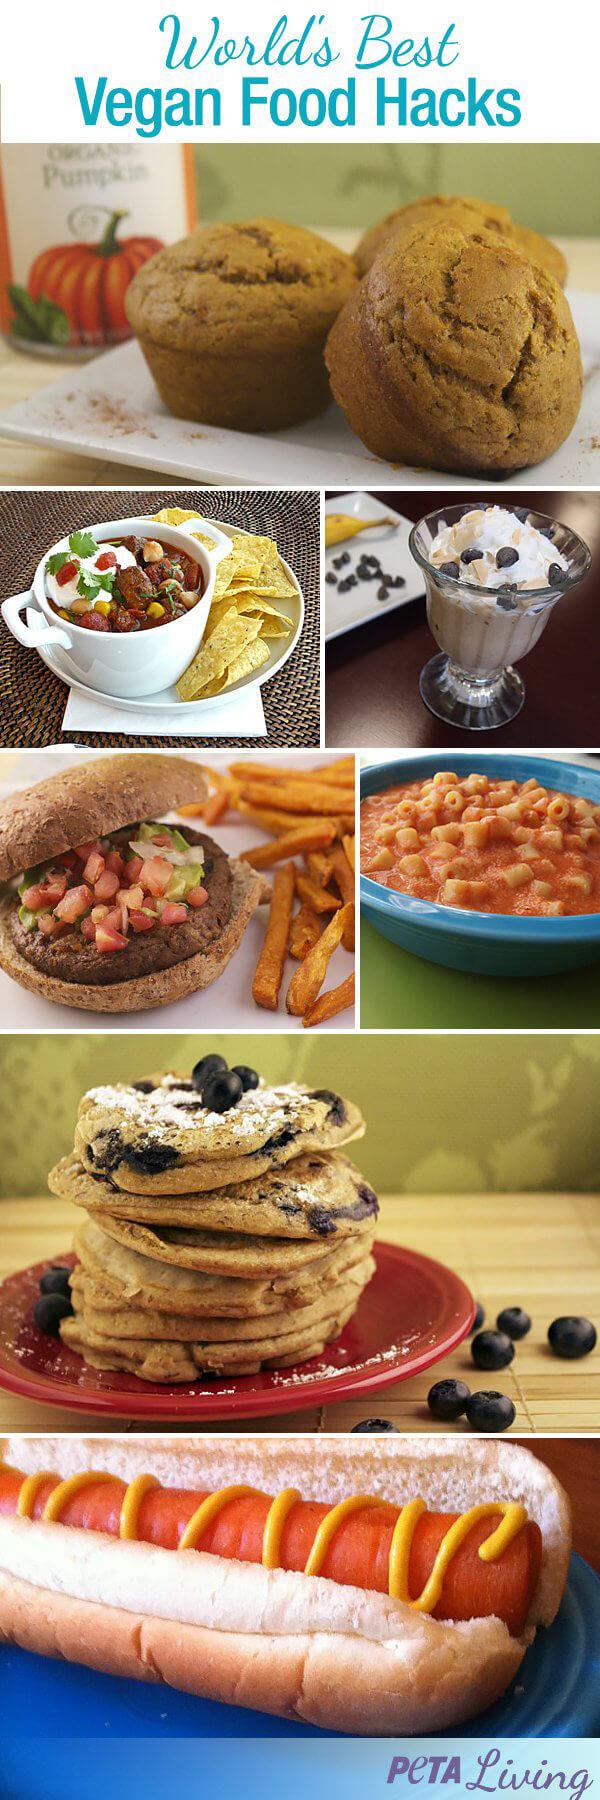 Best Vegan Food Hacks Share Able